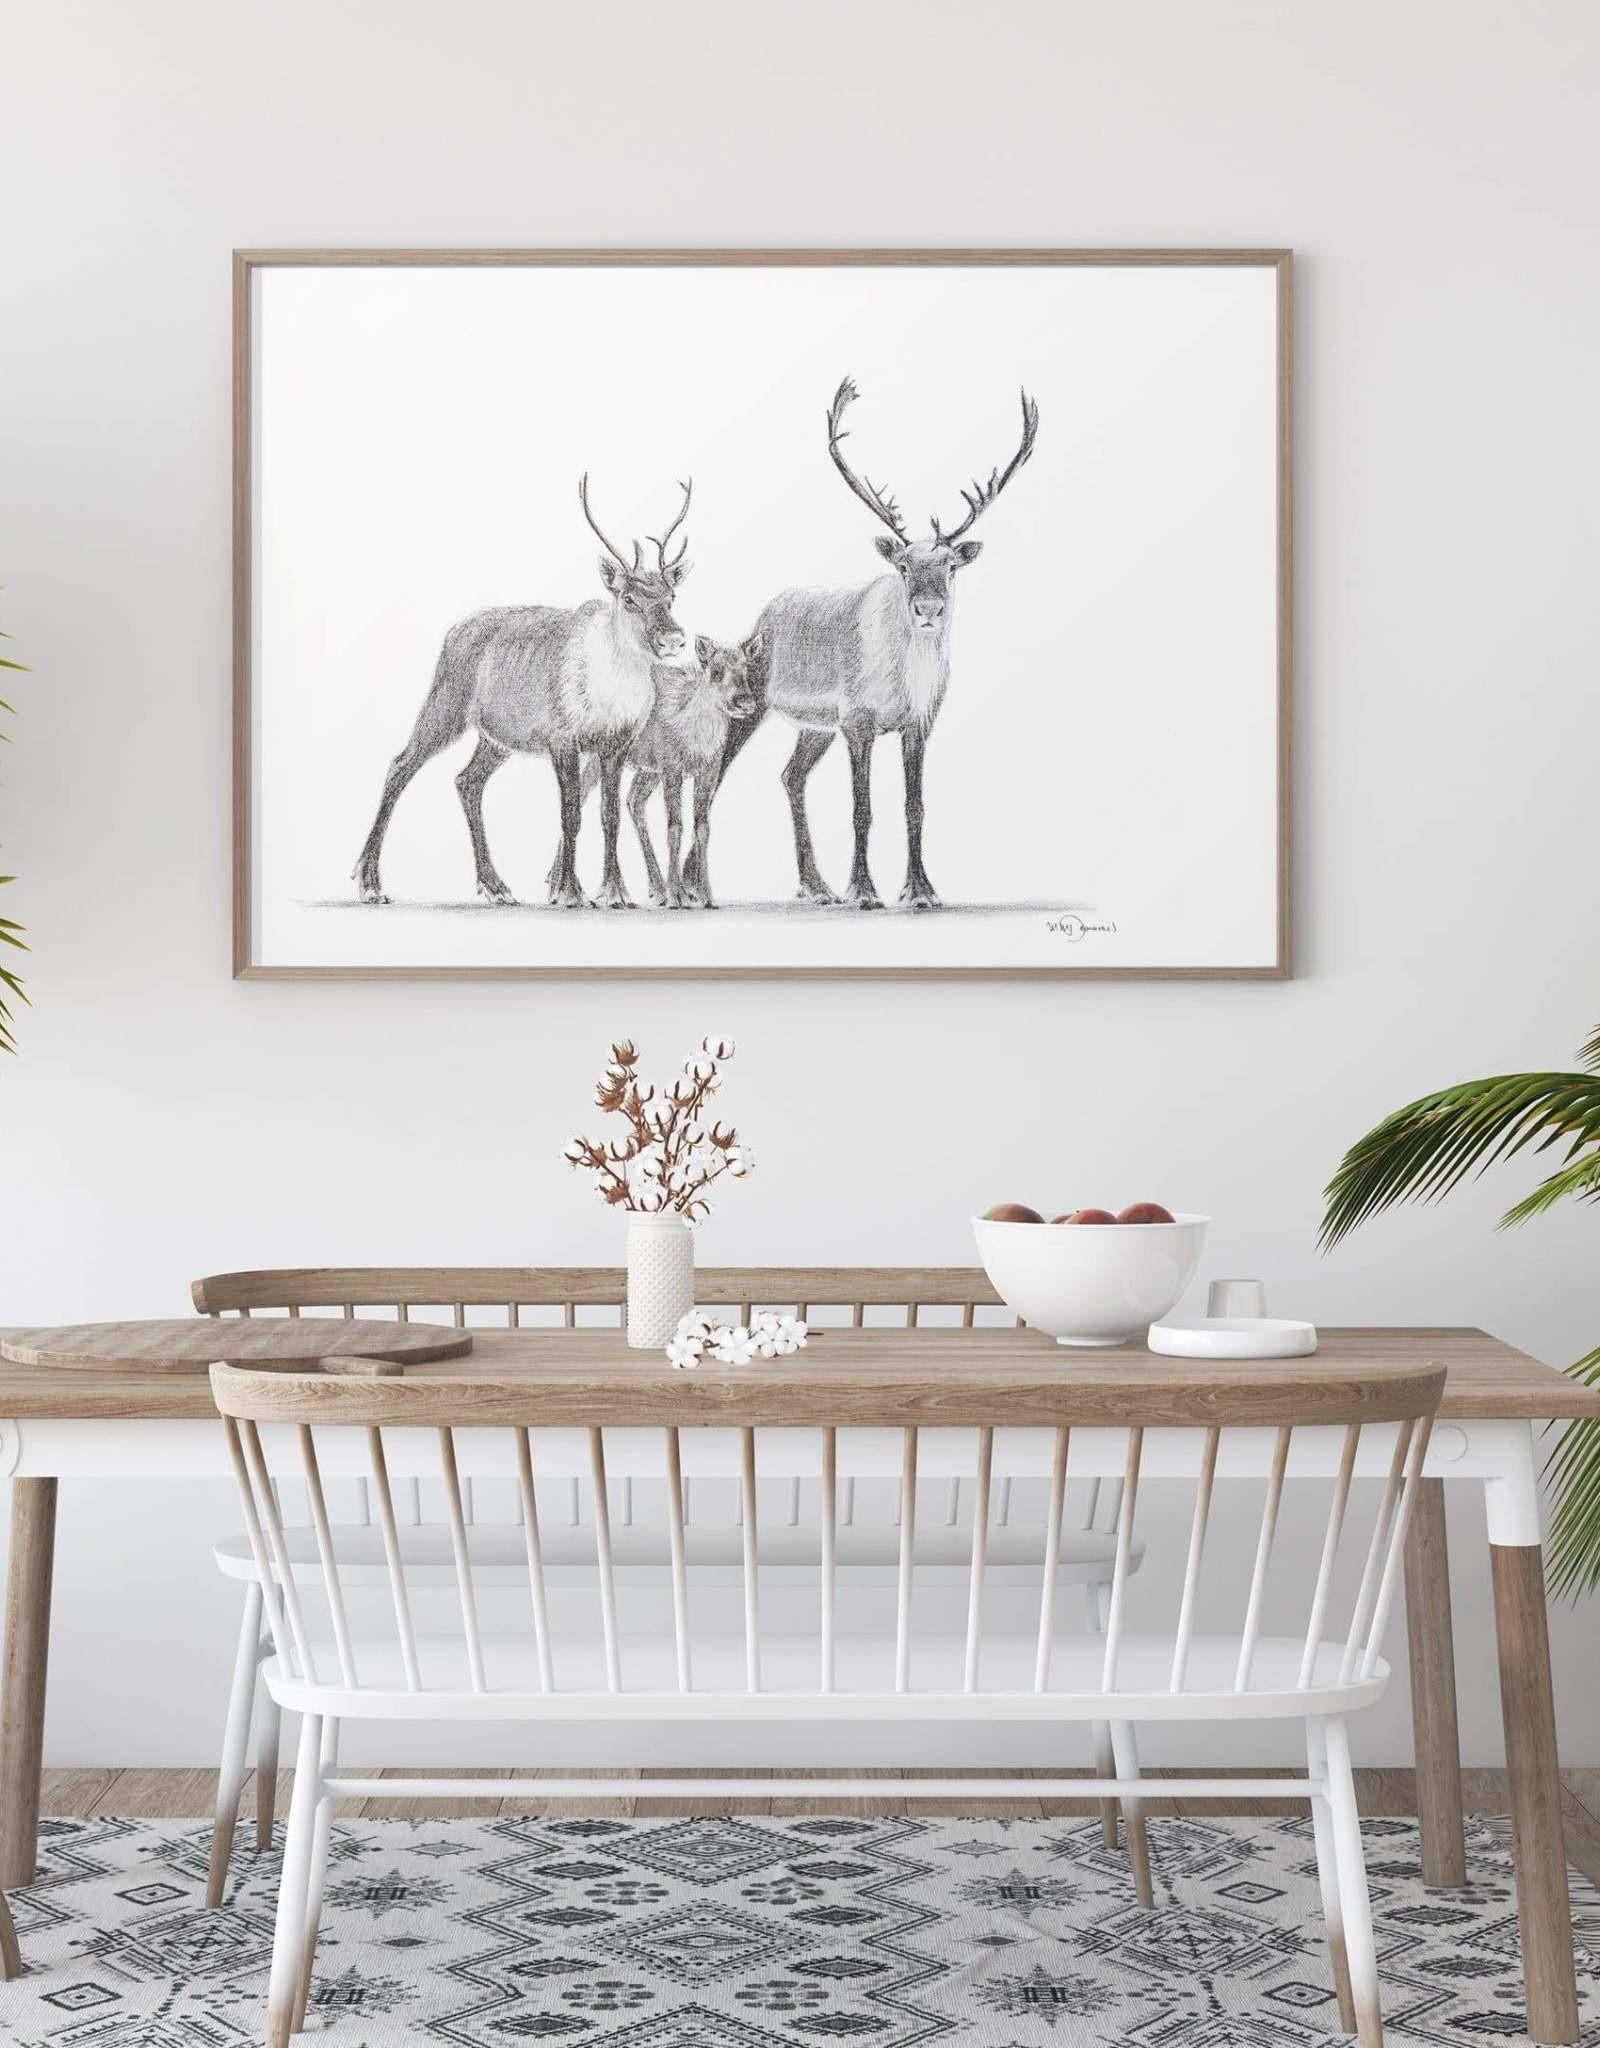 Le Nid atelier Illustration 12x18 - Famille caribou